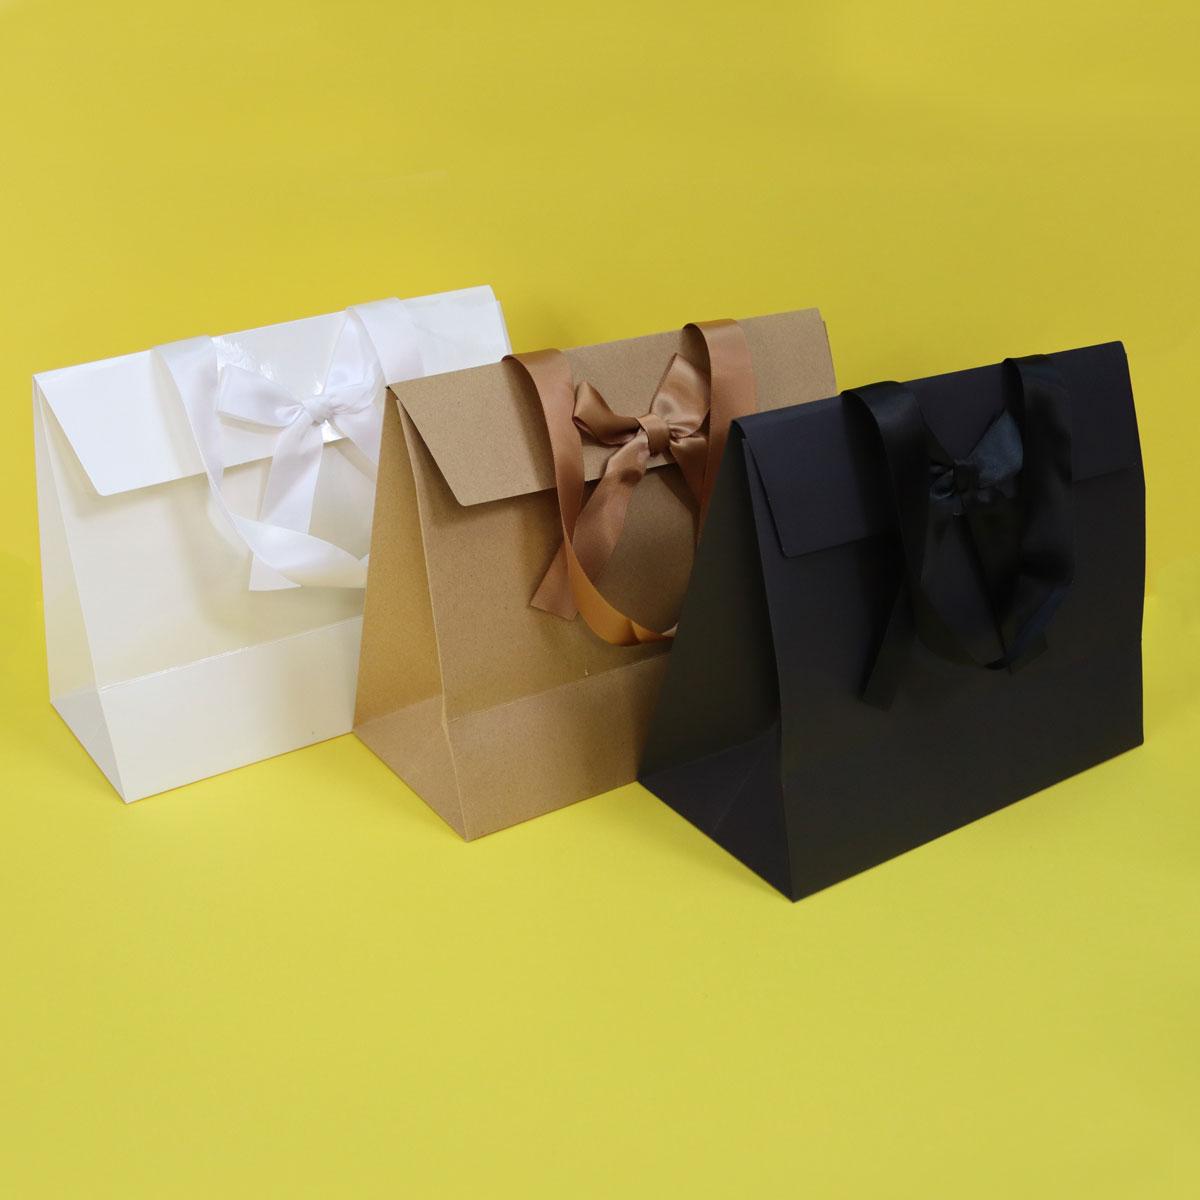 papierenKadotassen-papergiftbags-strik-1_(1)